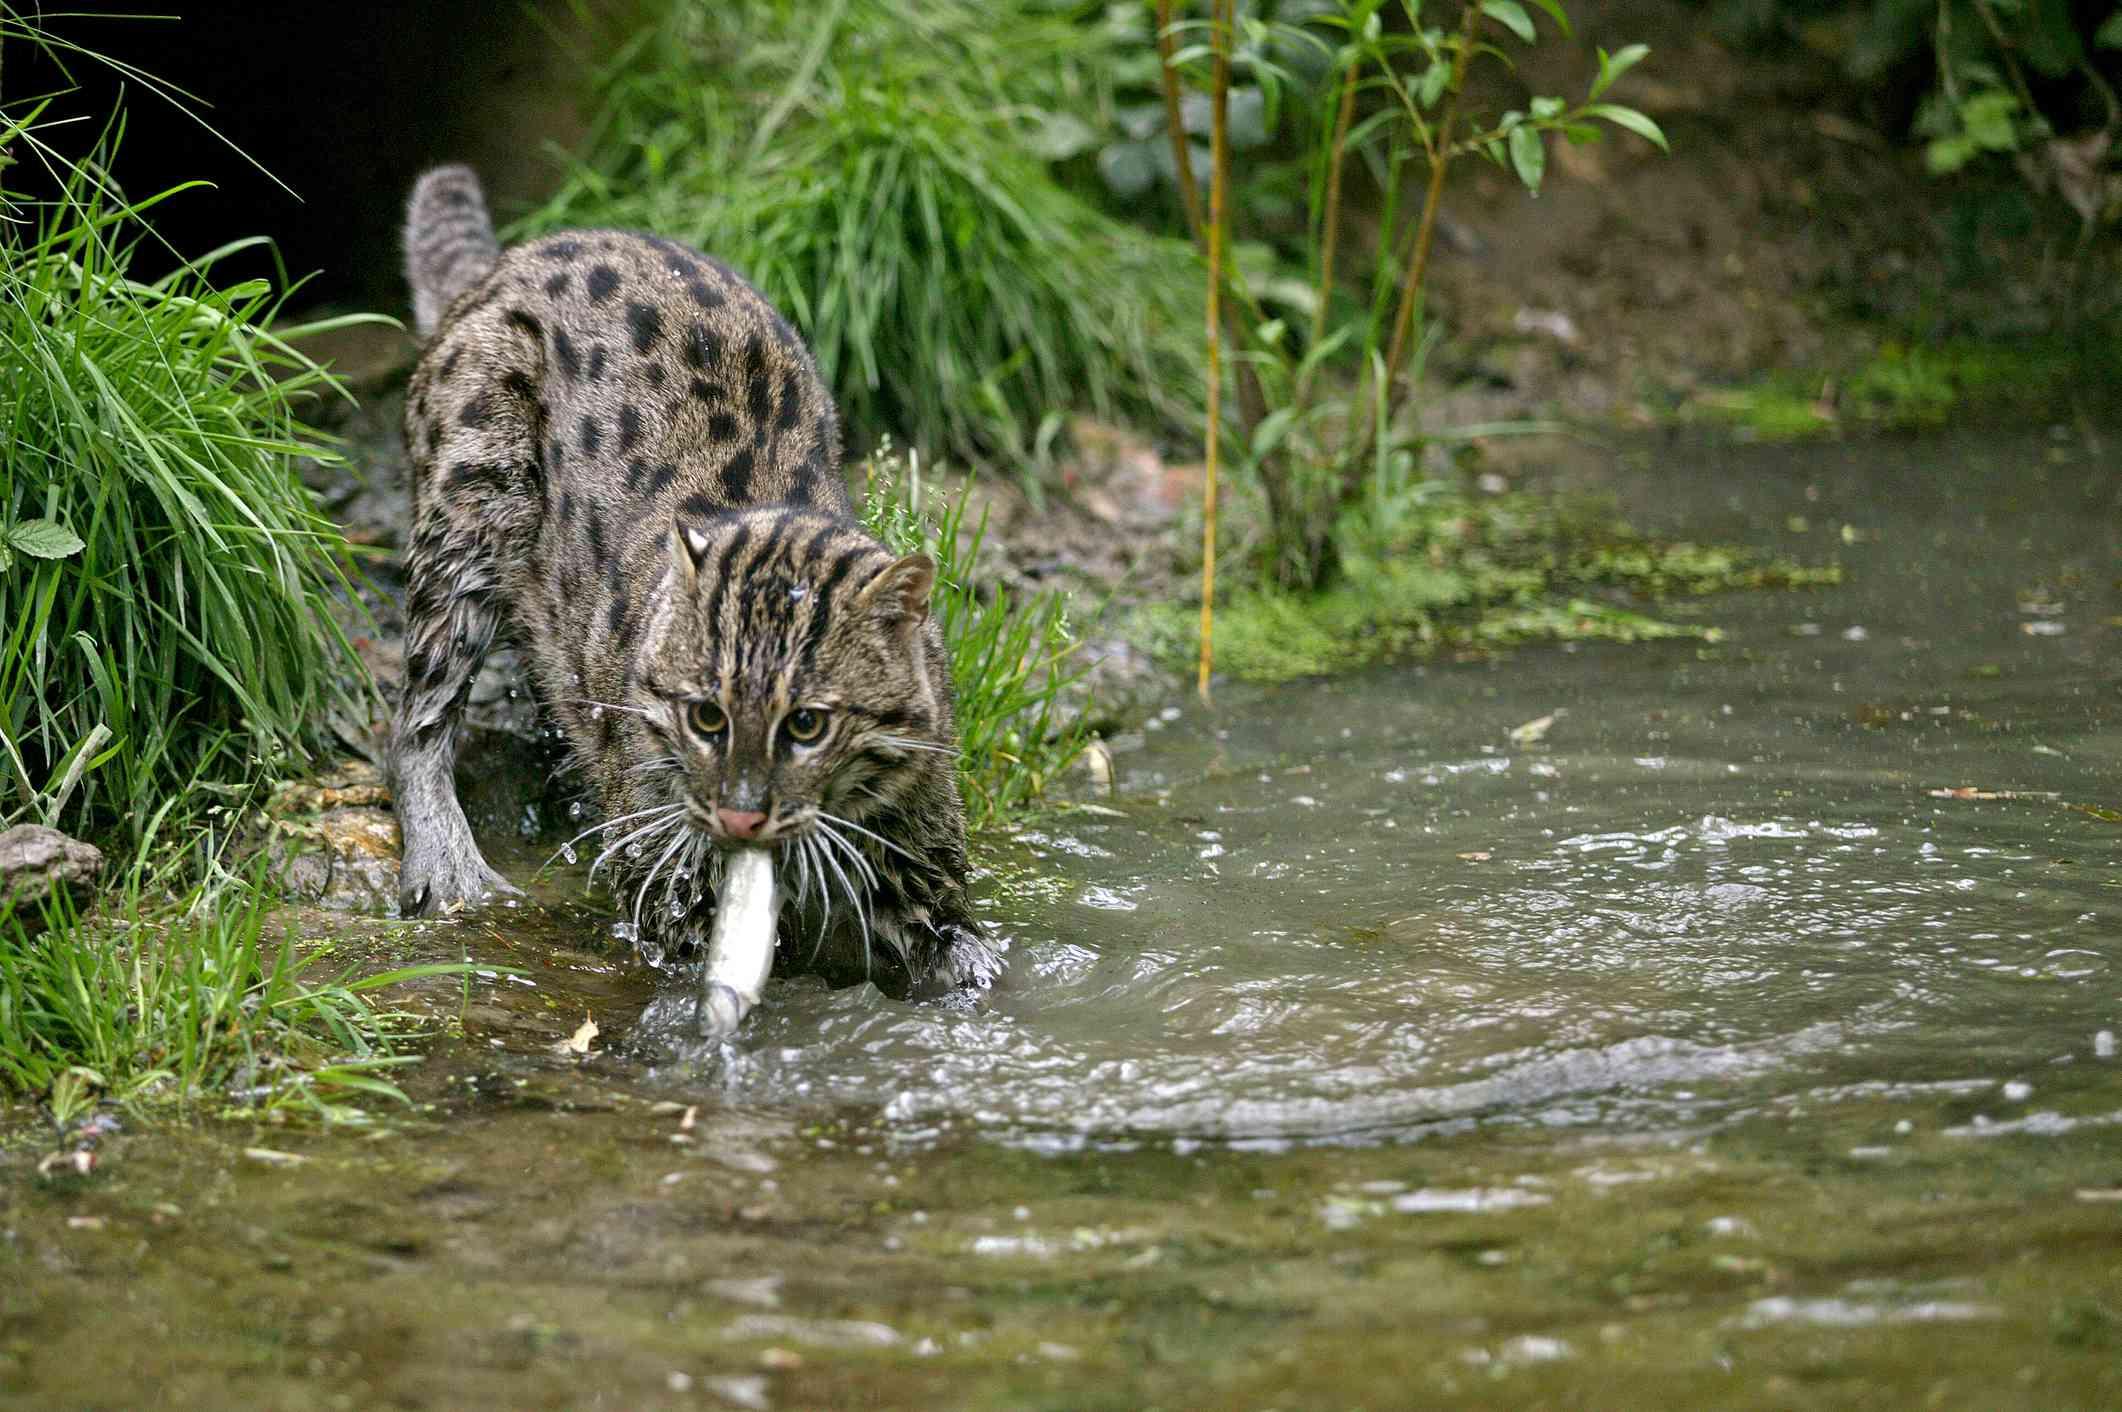 FISHING CAT prionailurus viverrinus, ADULT IN WATER CATCHING FISH